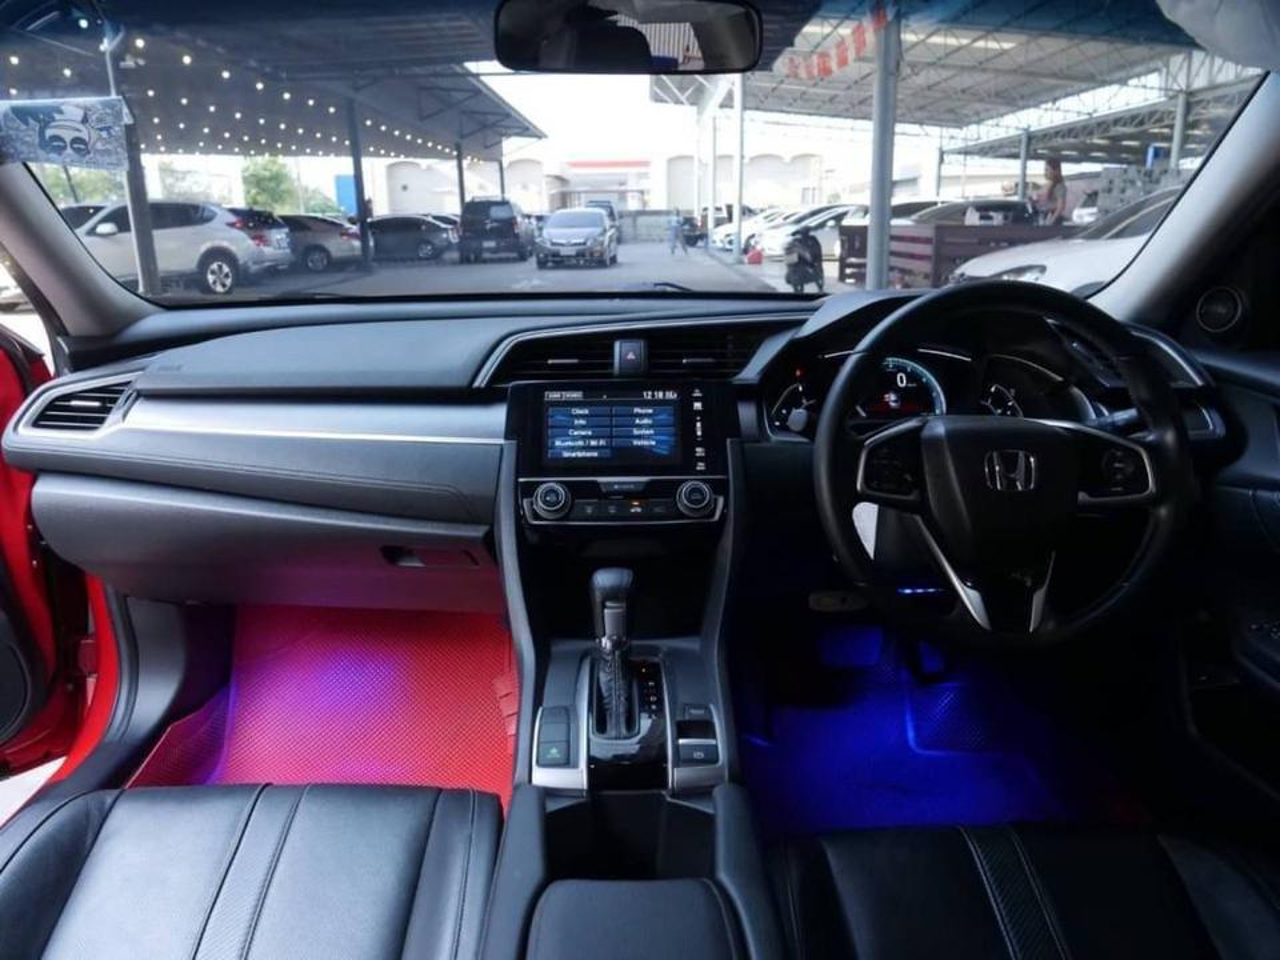 86 Honda Civic FC 1.8 EL Top 2018 Auto สีแดง รูปที่ 2